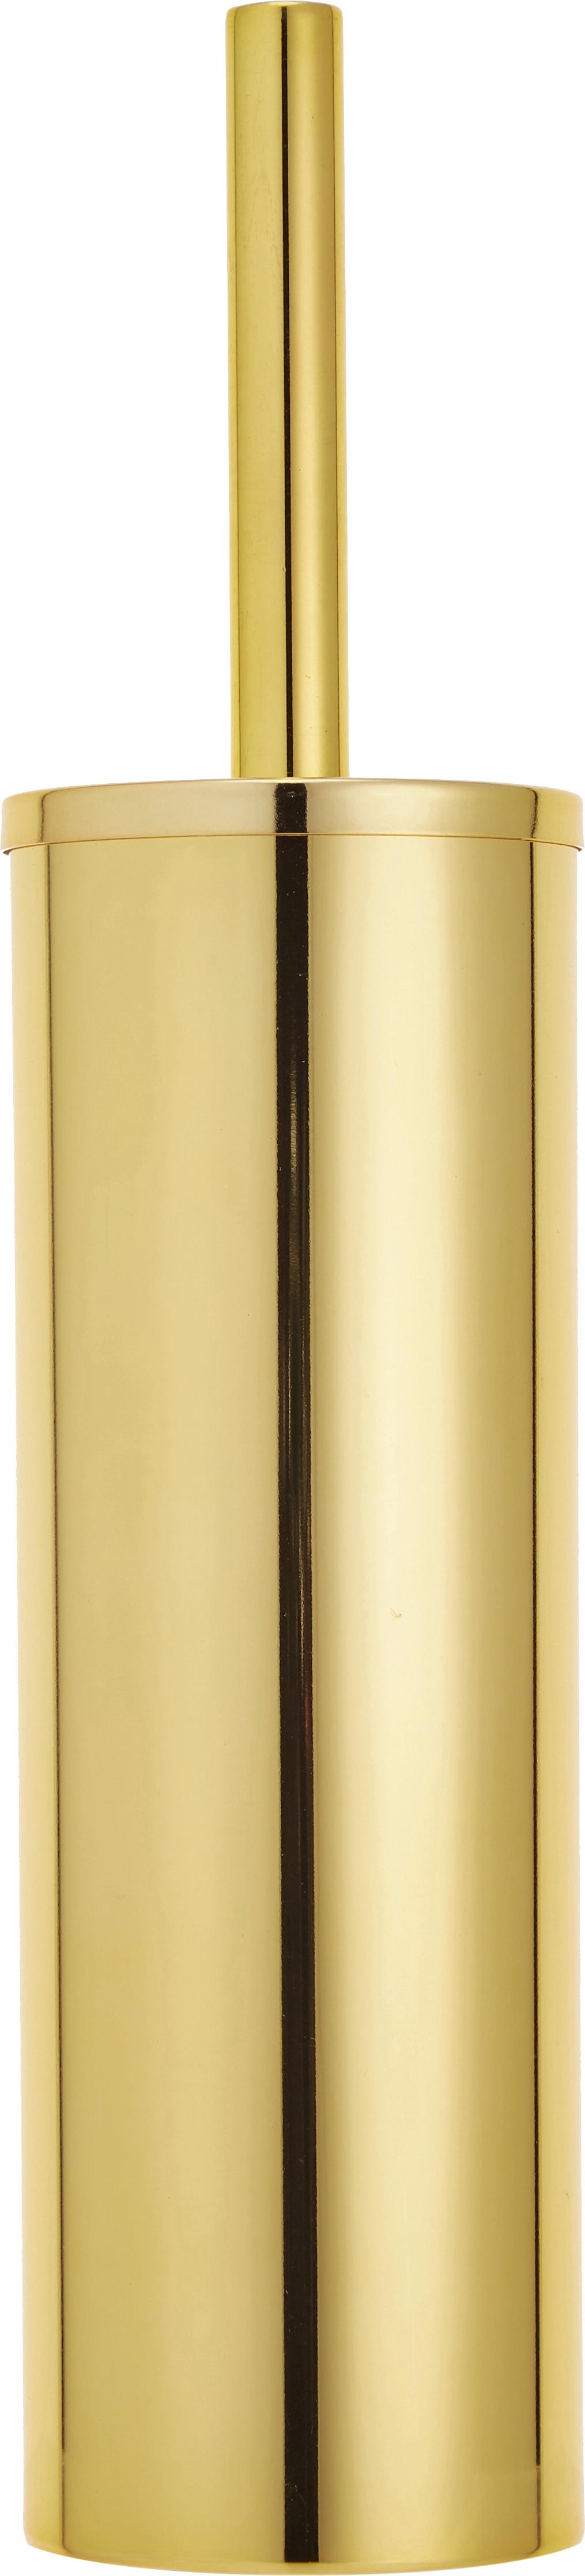 Toiletborstel Classic, Gelakt metaal, Goudkleurig, Ø 9 x H 40 cm